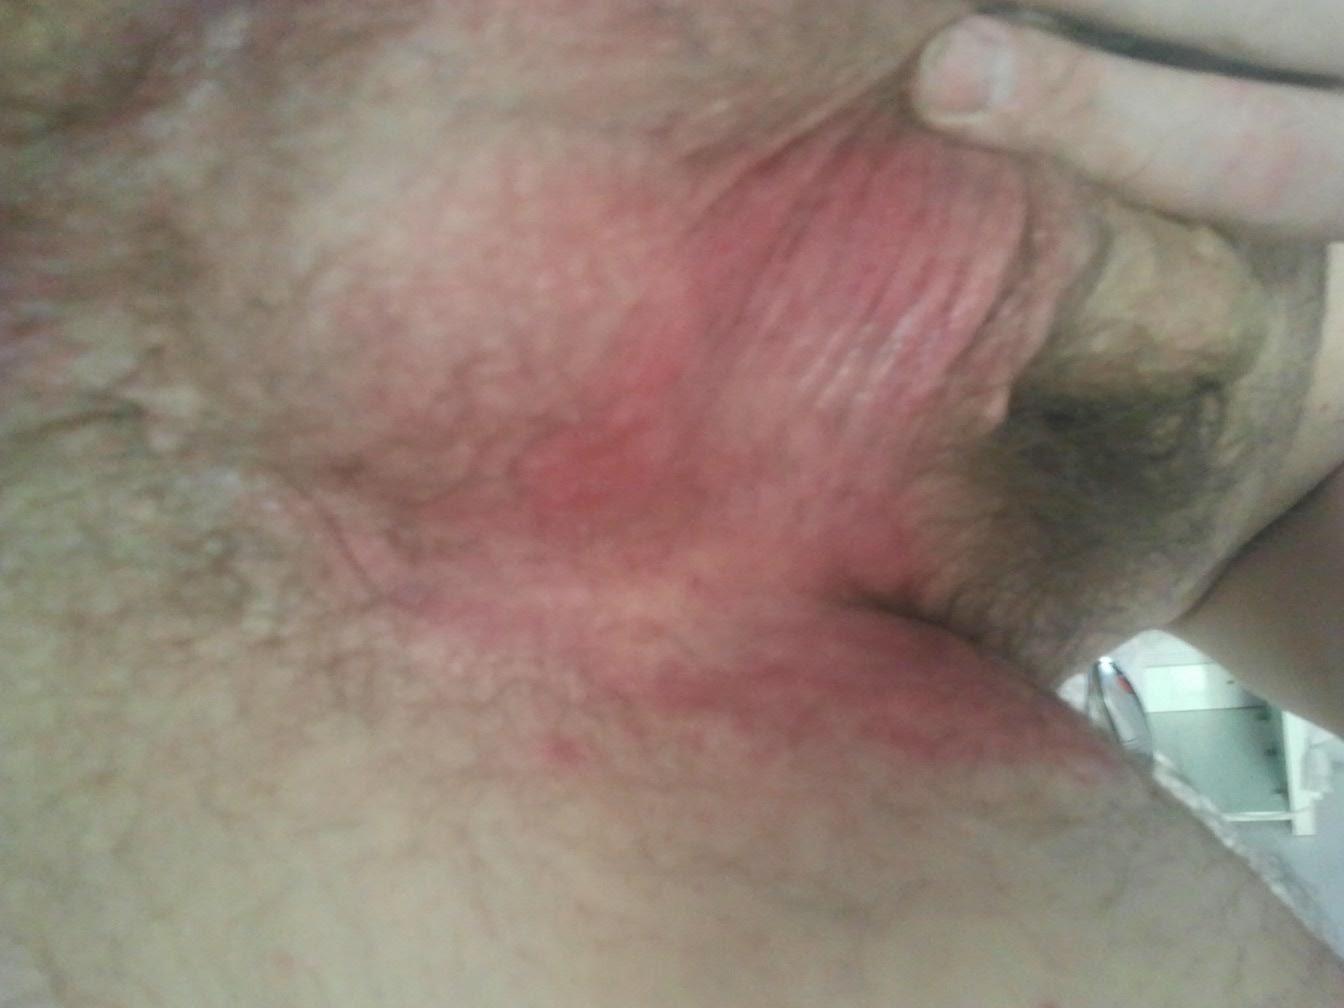 vospalenie-vozle-anusa